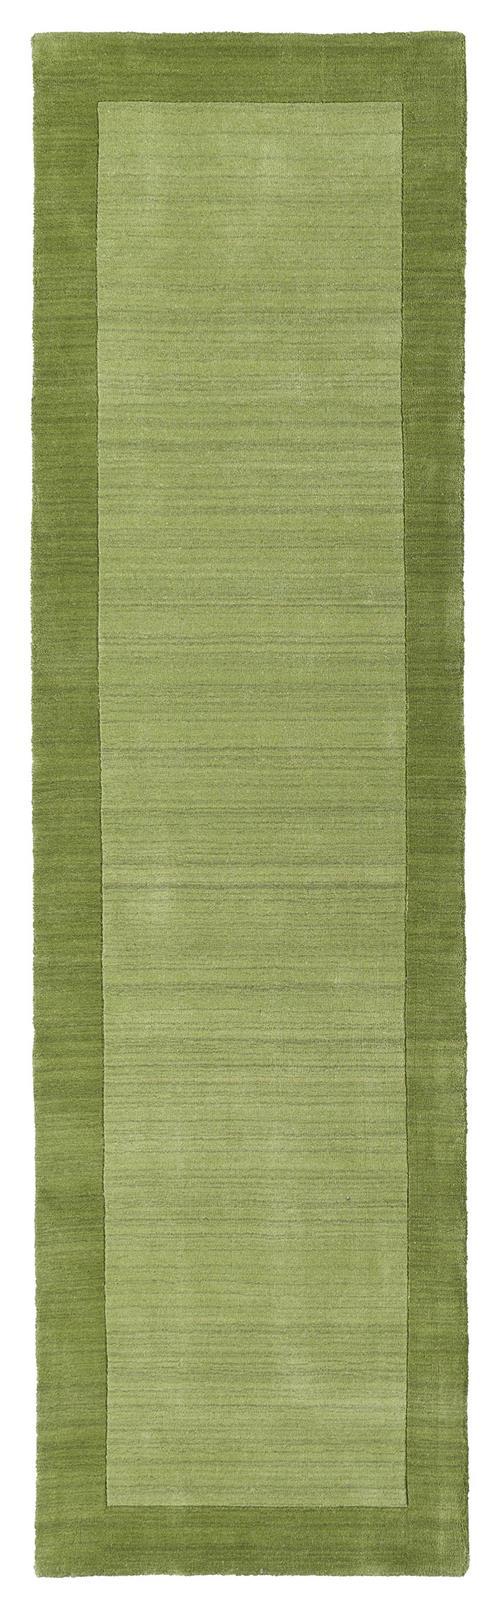 Regency Collection-7000-33-Celery